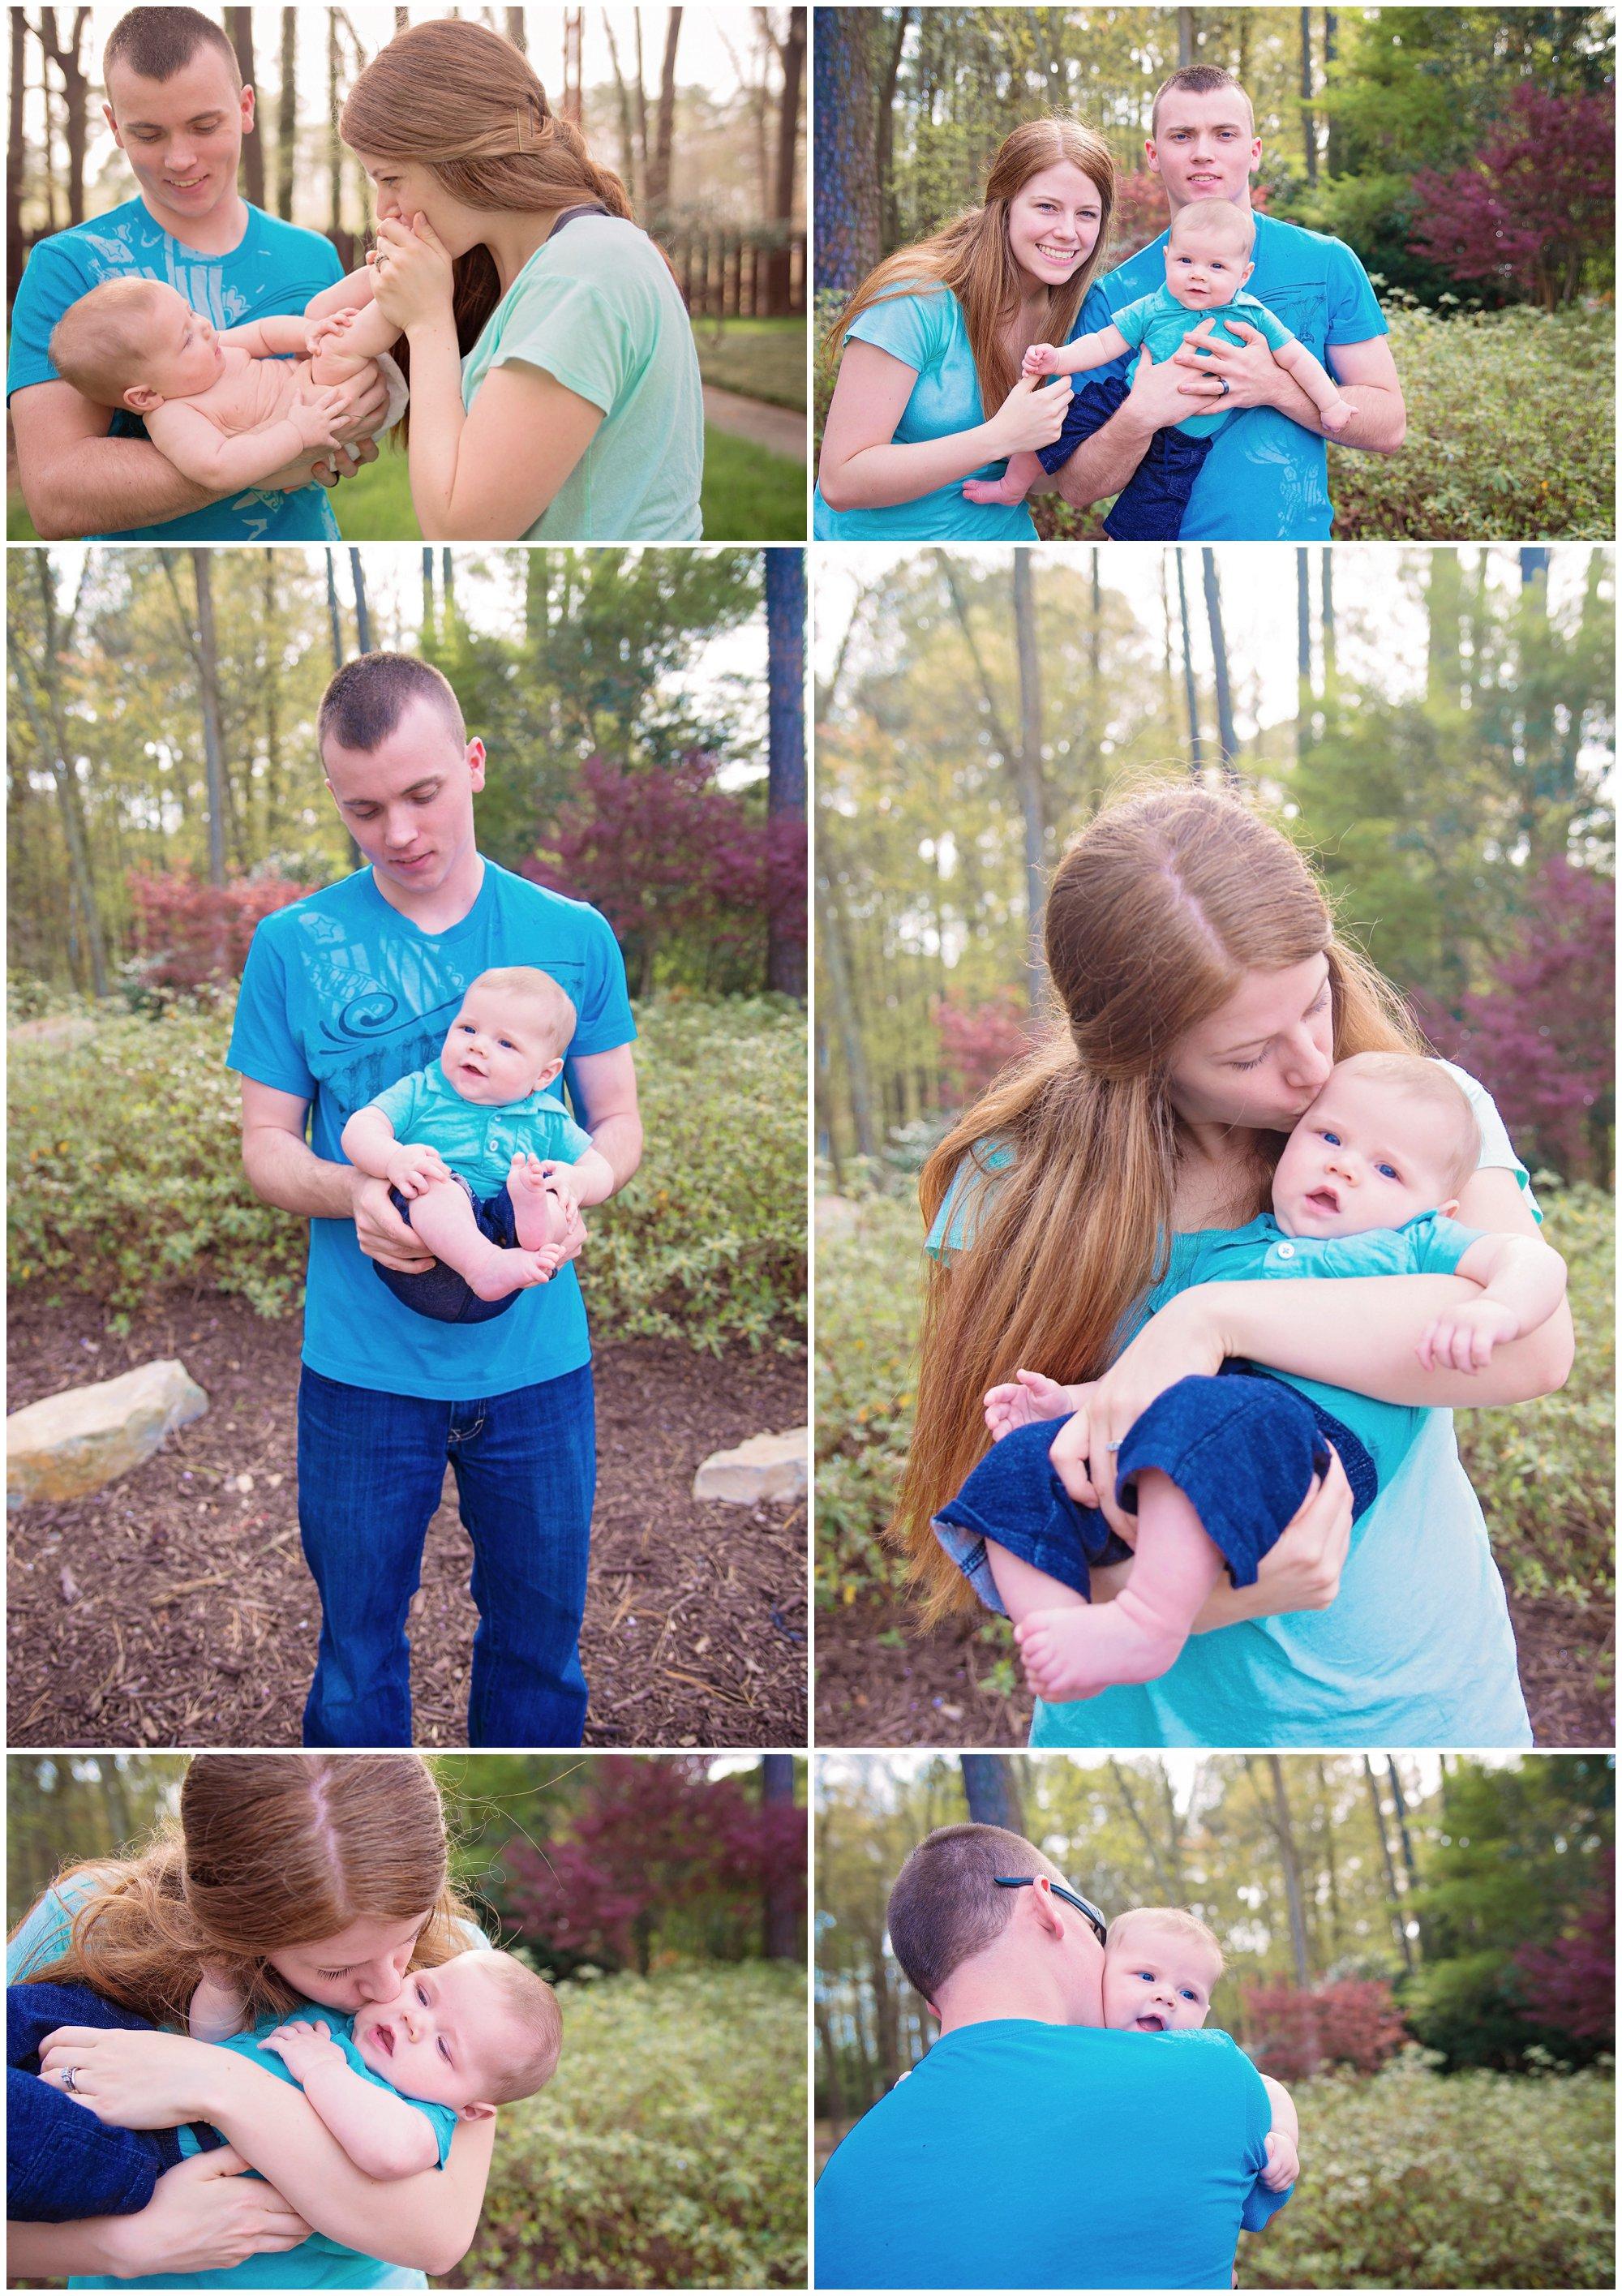 Virginia Beach Child Photographer | Tristan 6 Months